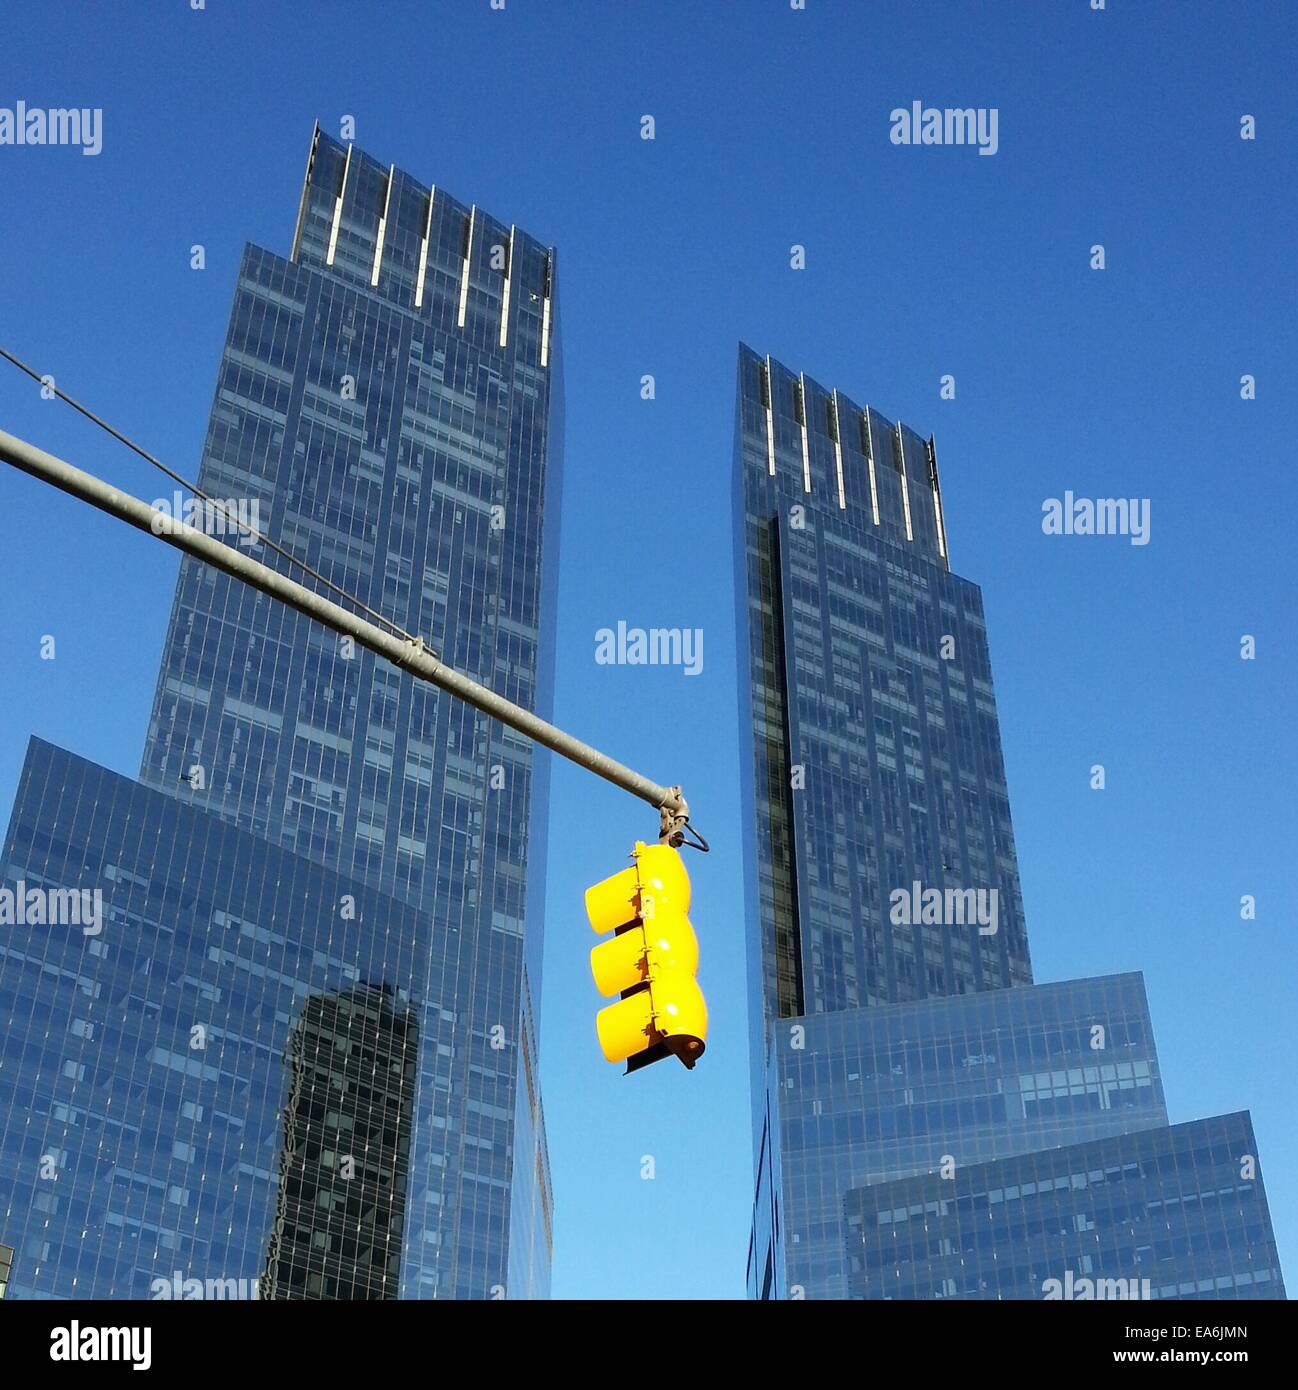 Time Warner Center Wolkenkratzer, Columbus Circle, Manhattan, New York, Amerika, USA Stockbild